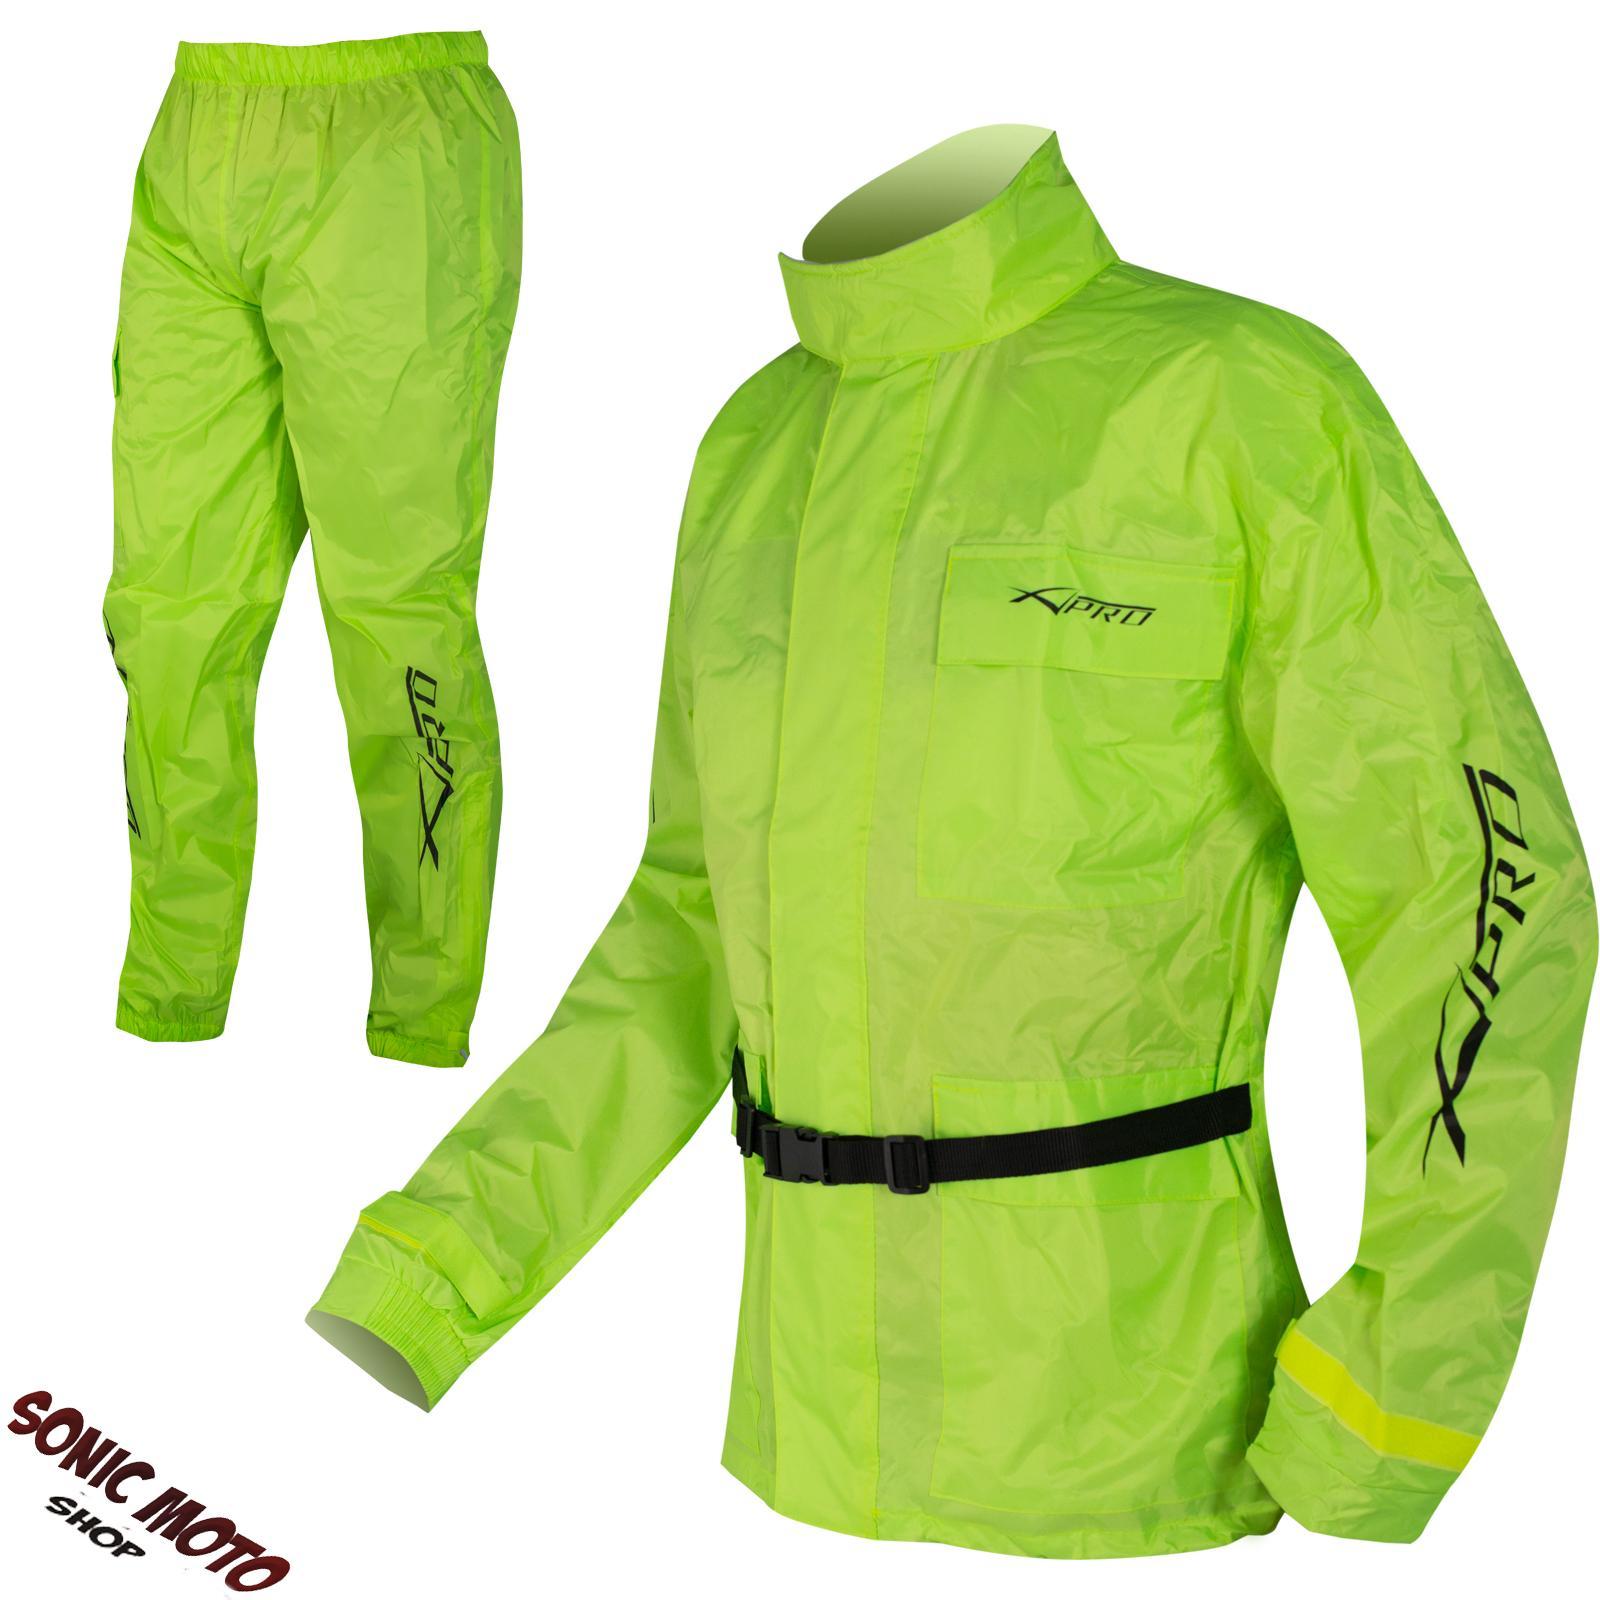 Motorcycle-Motorbike-Rain-Over-Suit-2-pc-Waterproof-Scooter-Hi-Vis-Sonicmoto